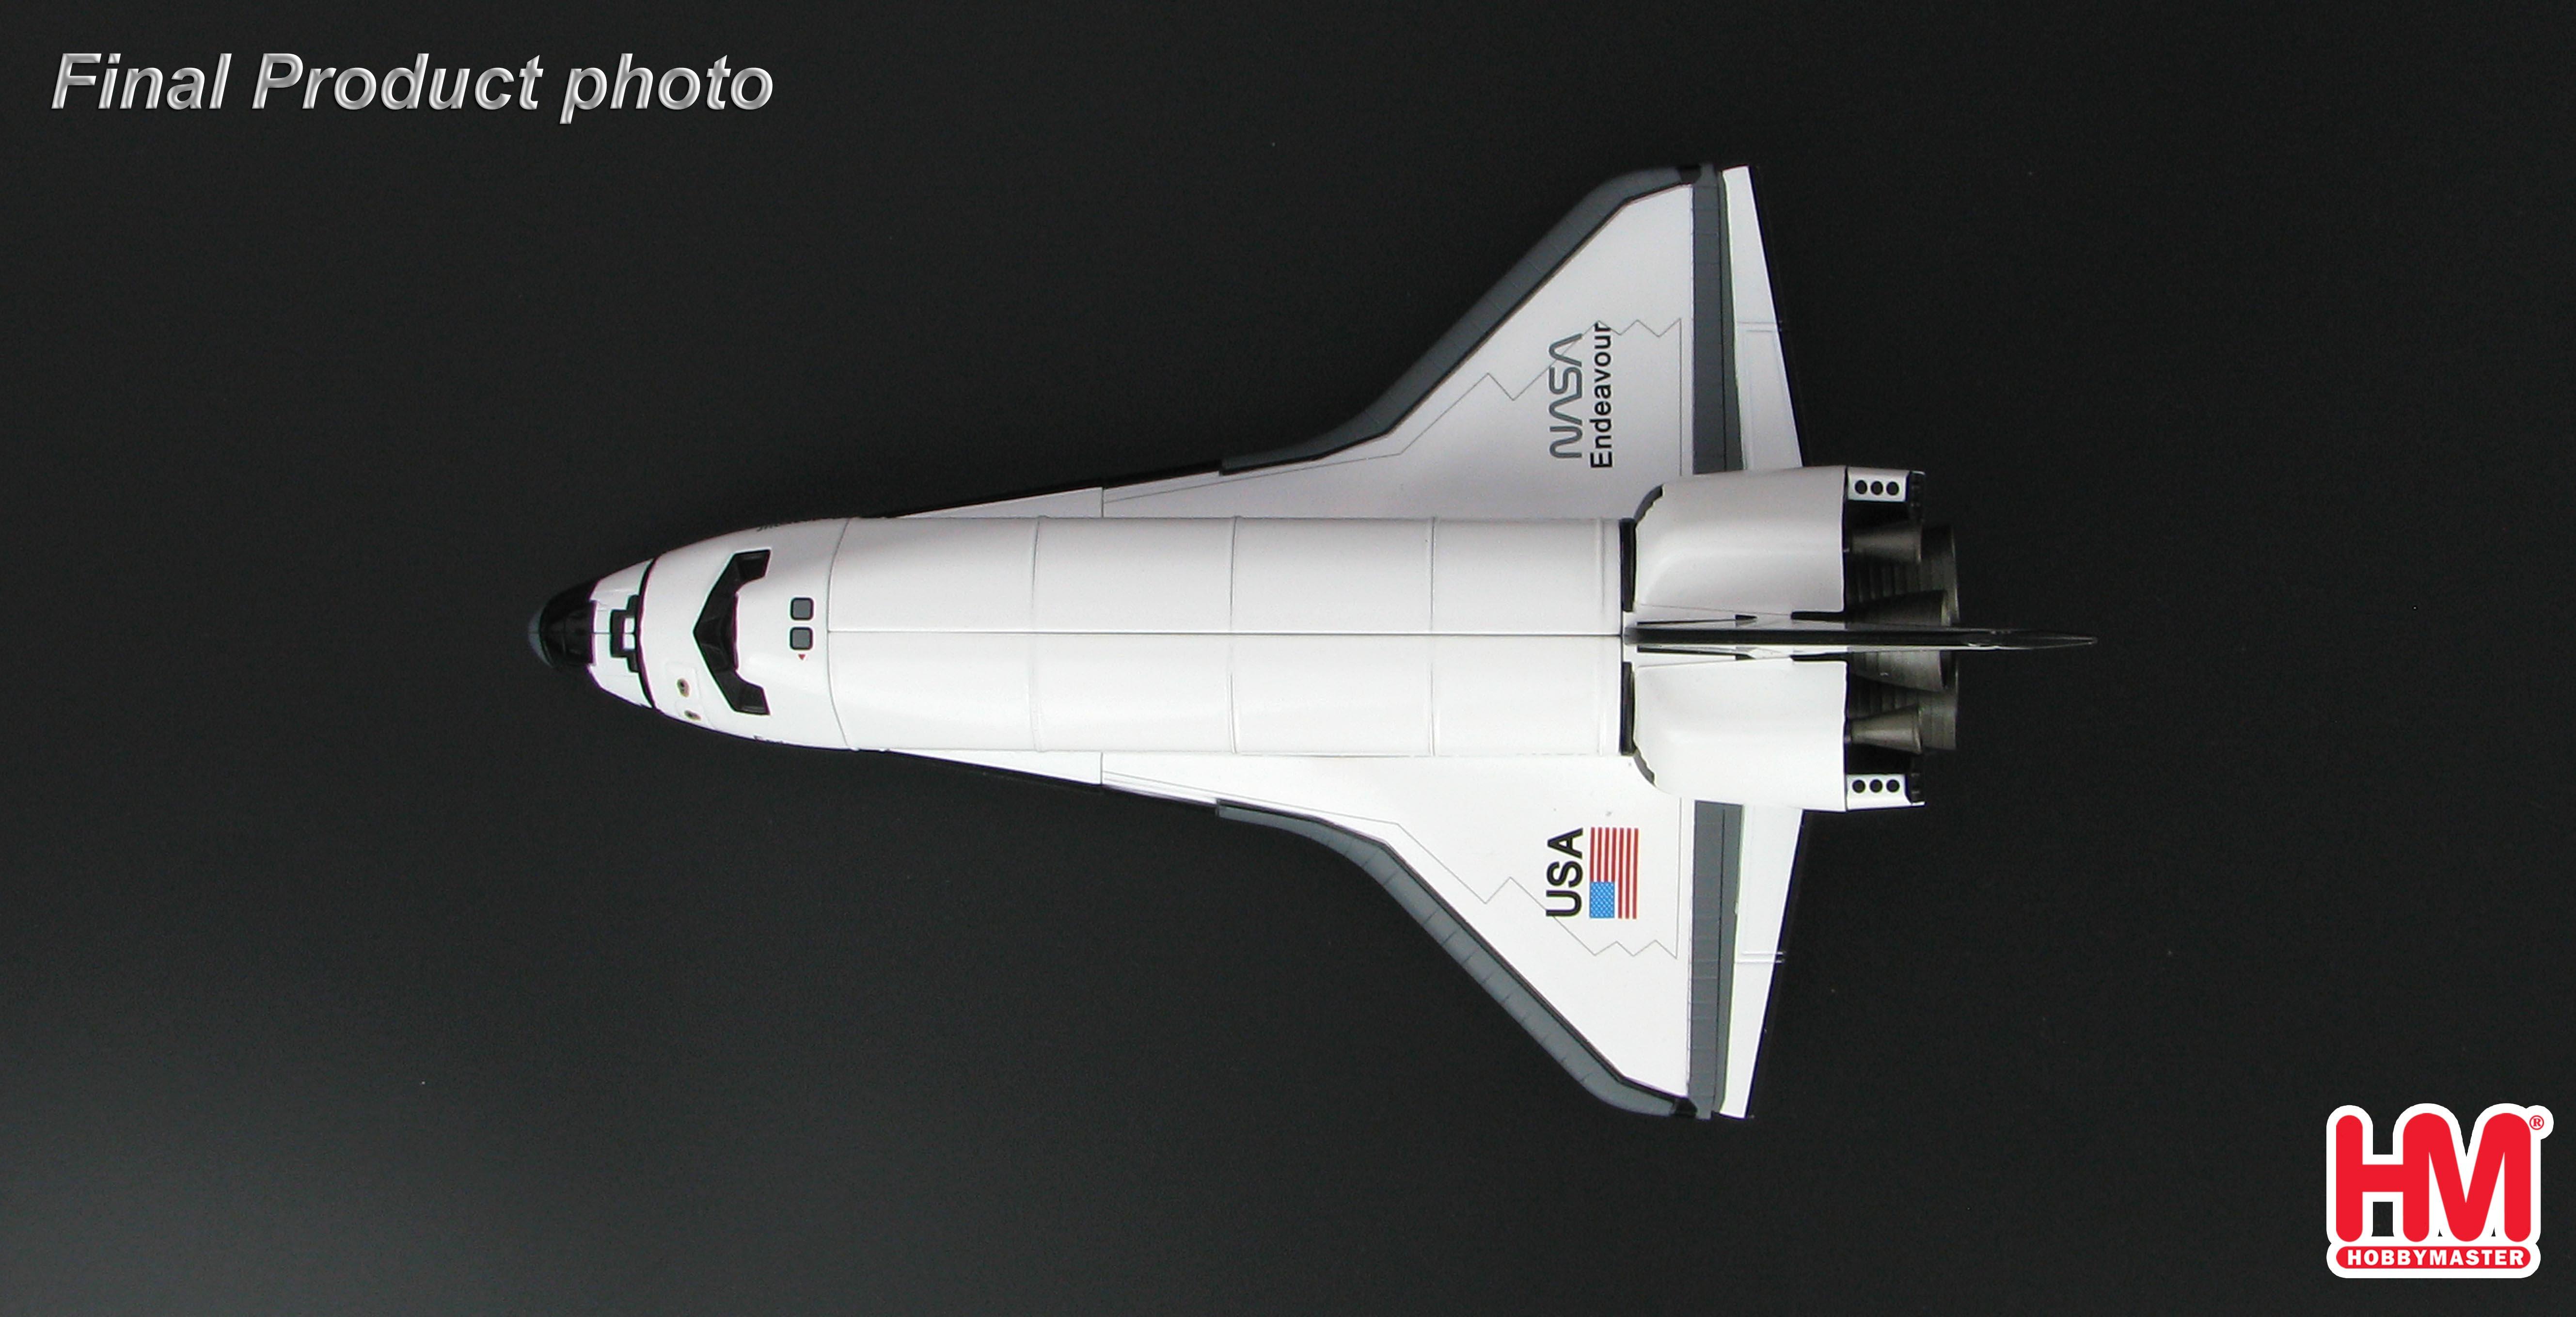 space shuttle endeavour 1992 - photo #32